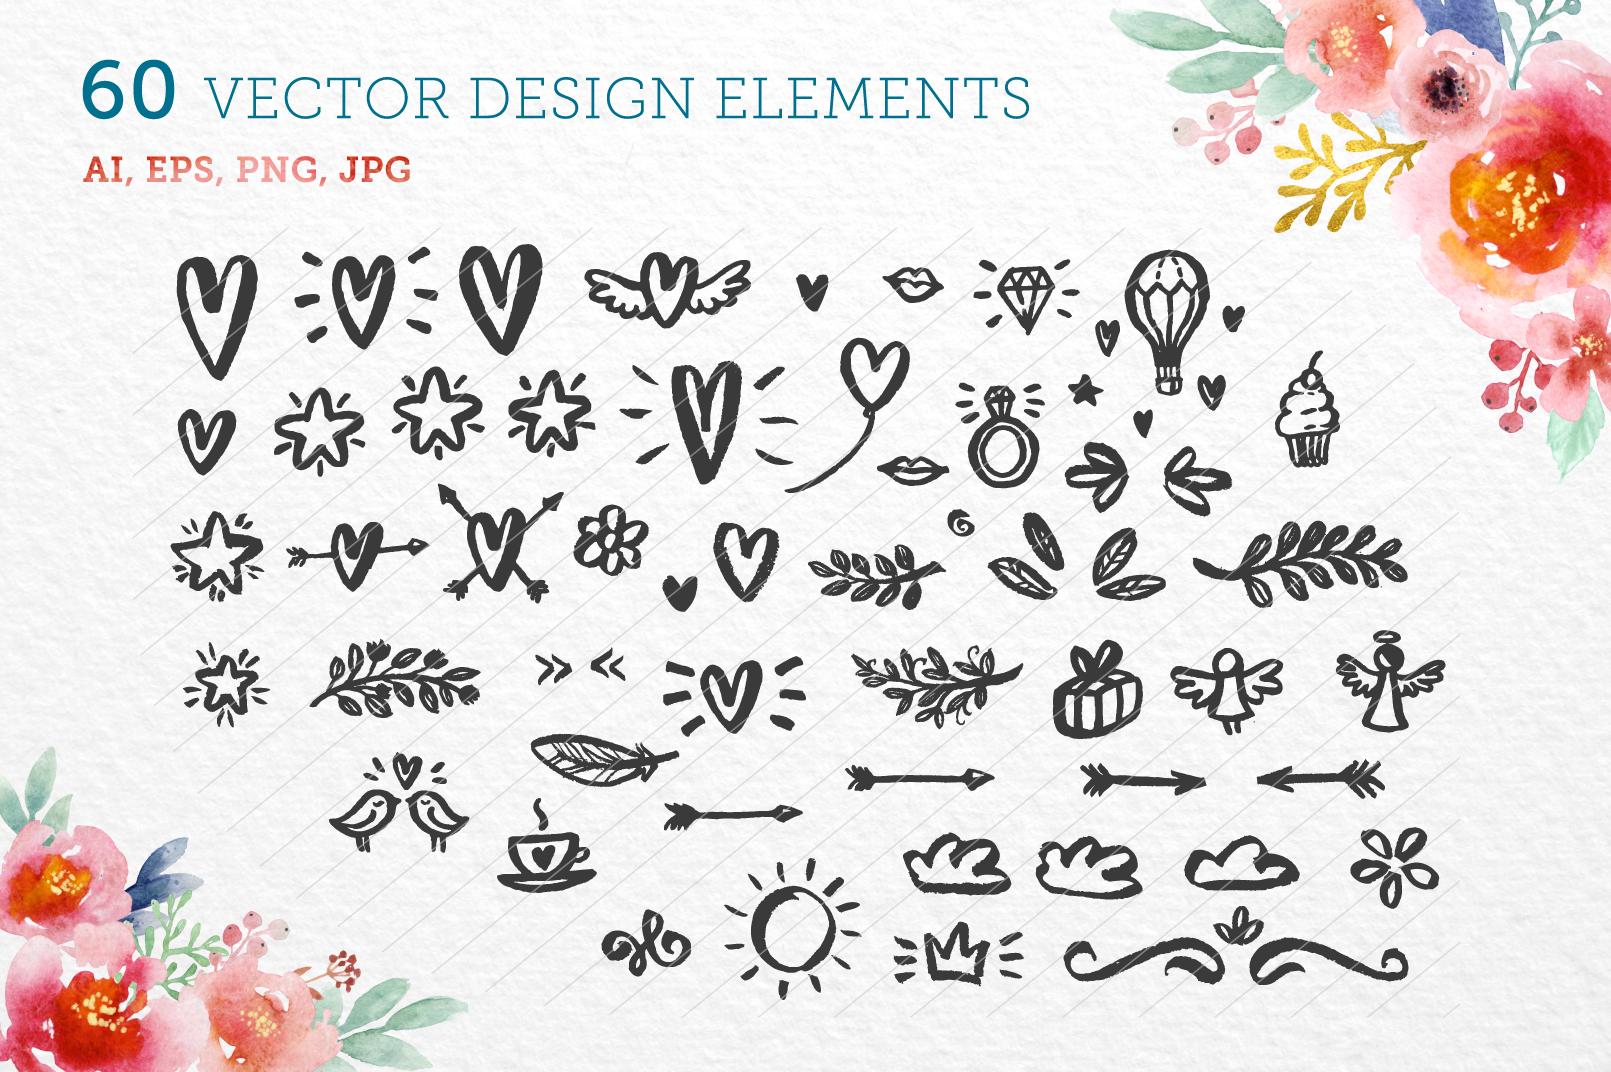 60 vector design elements example image 1